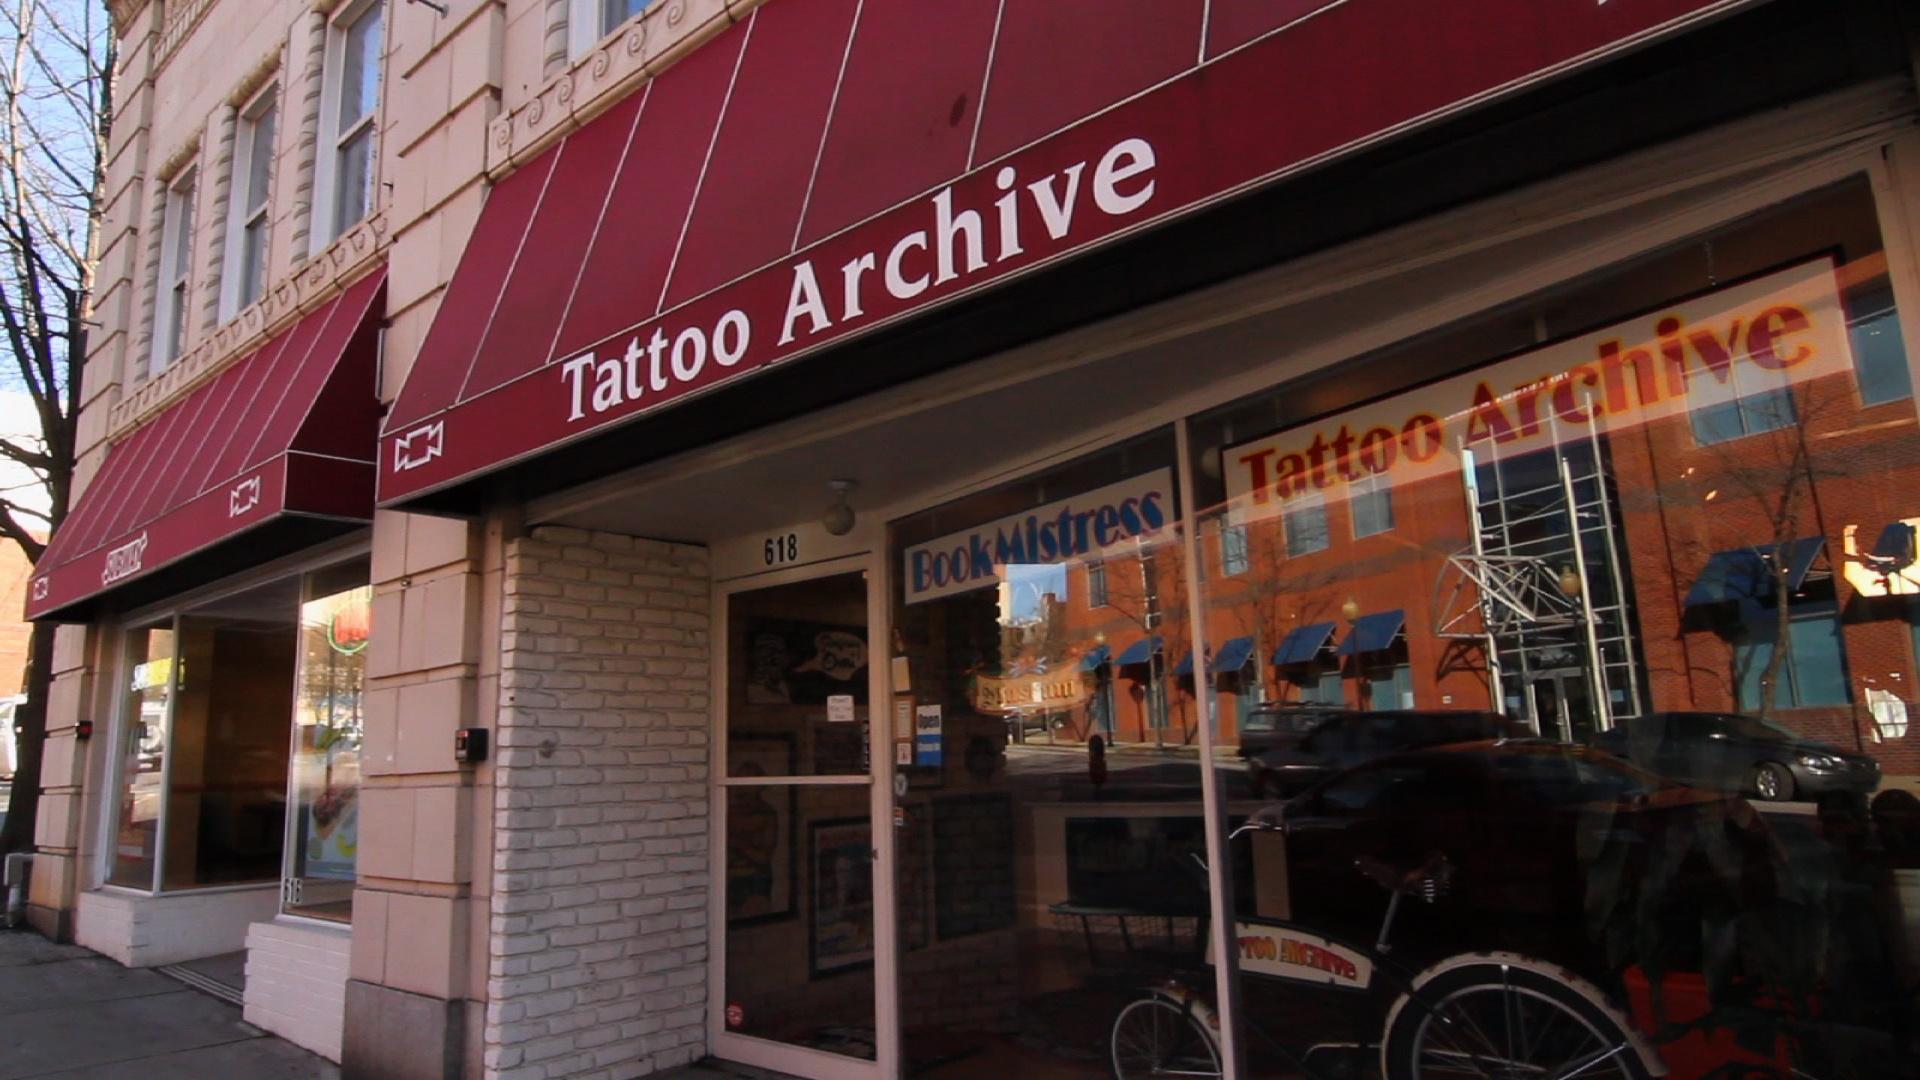 The Tattoo Archive Winston Salem image